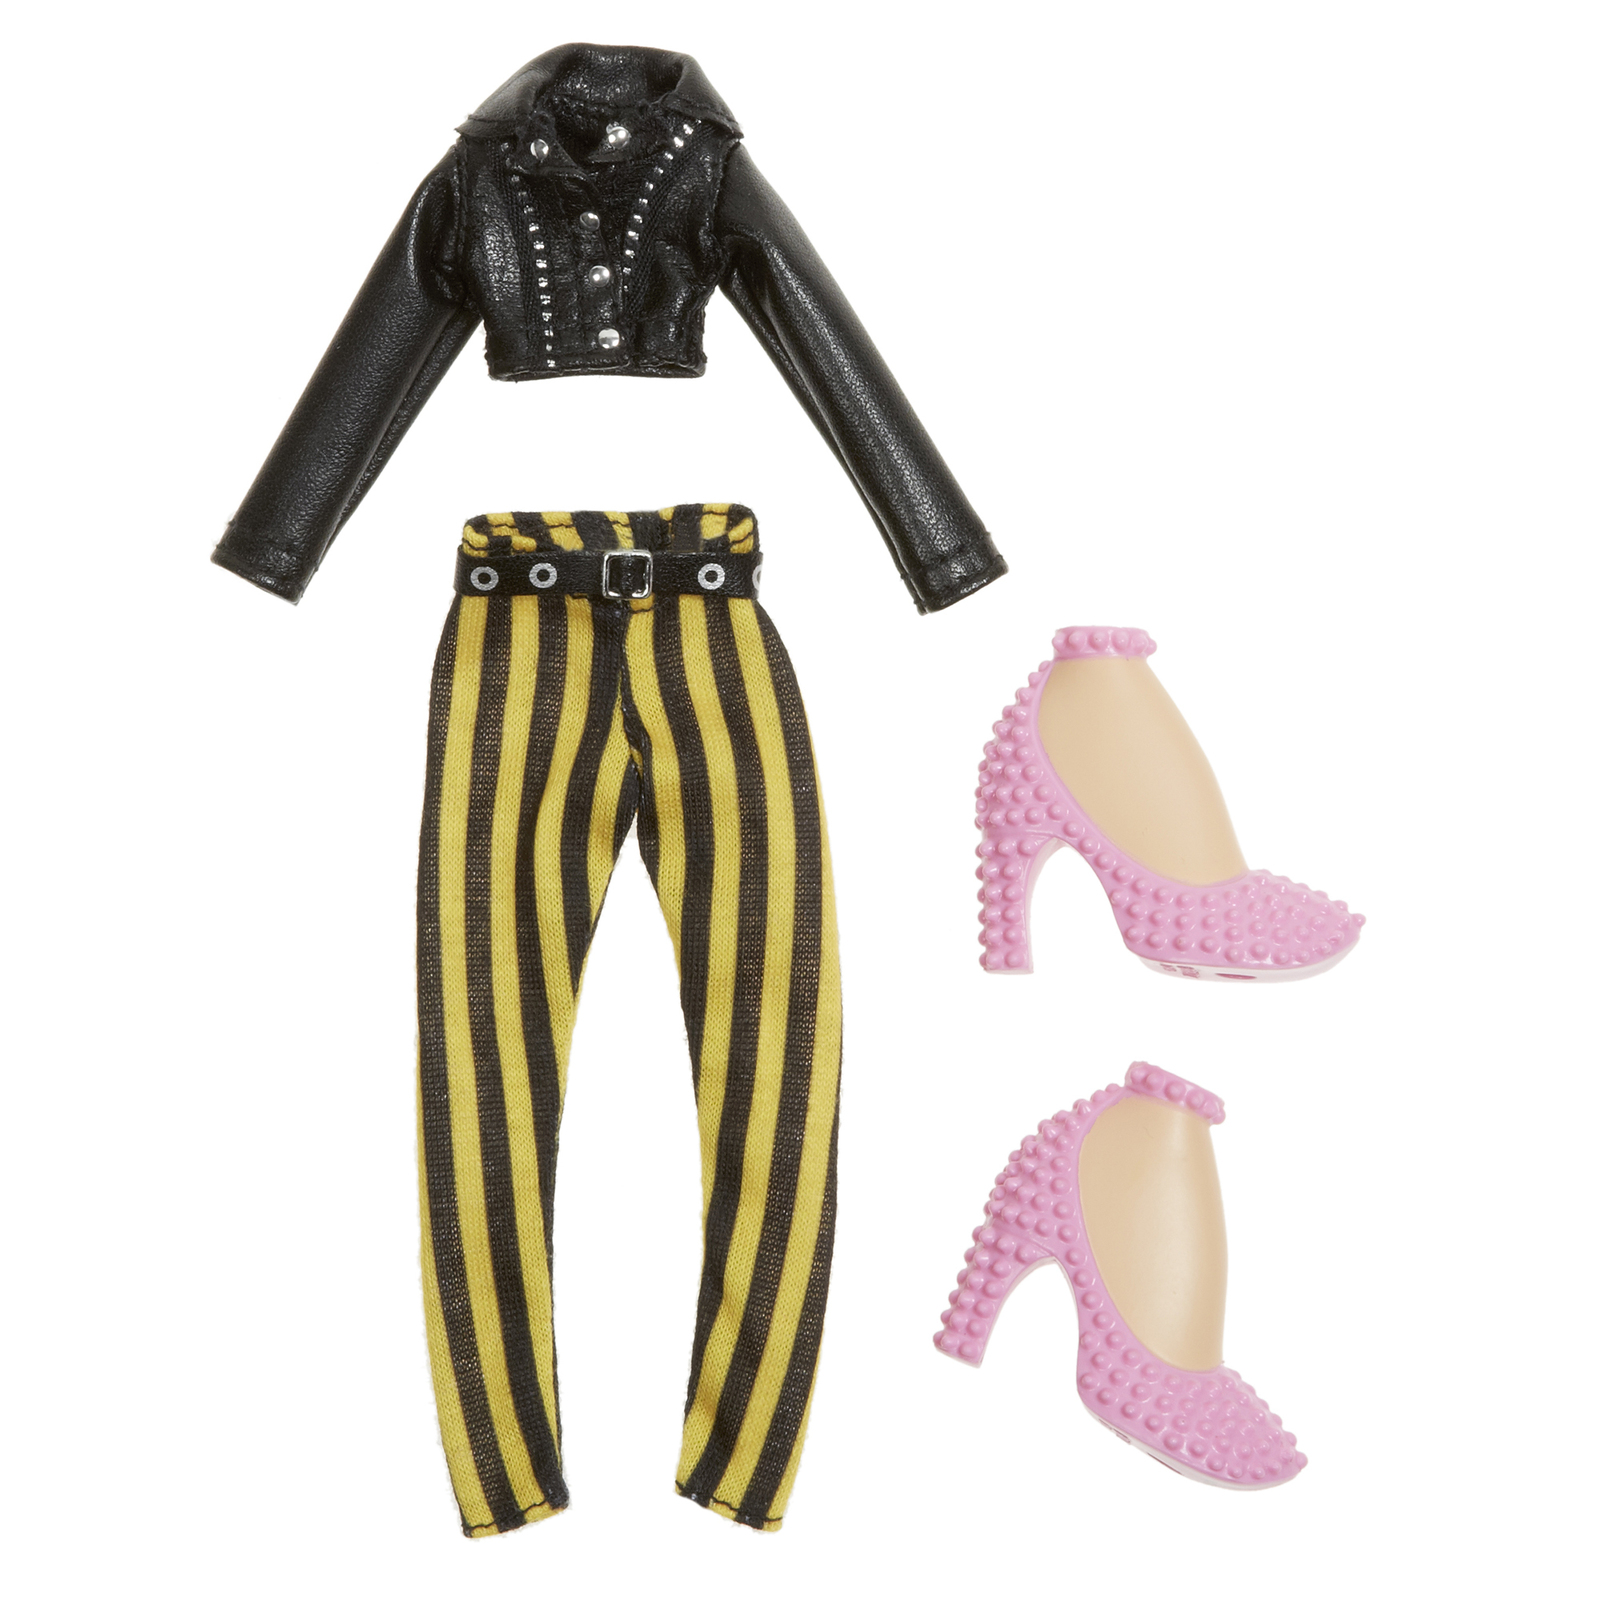 bratz fashion pack i love stripes toy at mighty ape nz. Black Bedroom Furniture Sets. Home Design Ideas